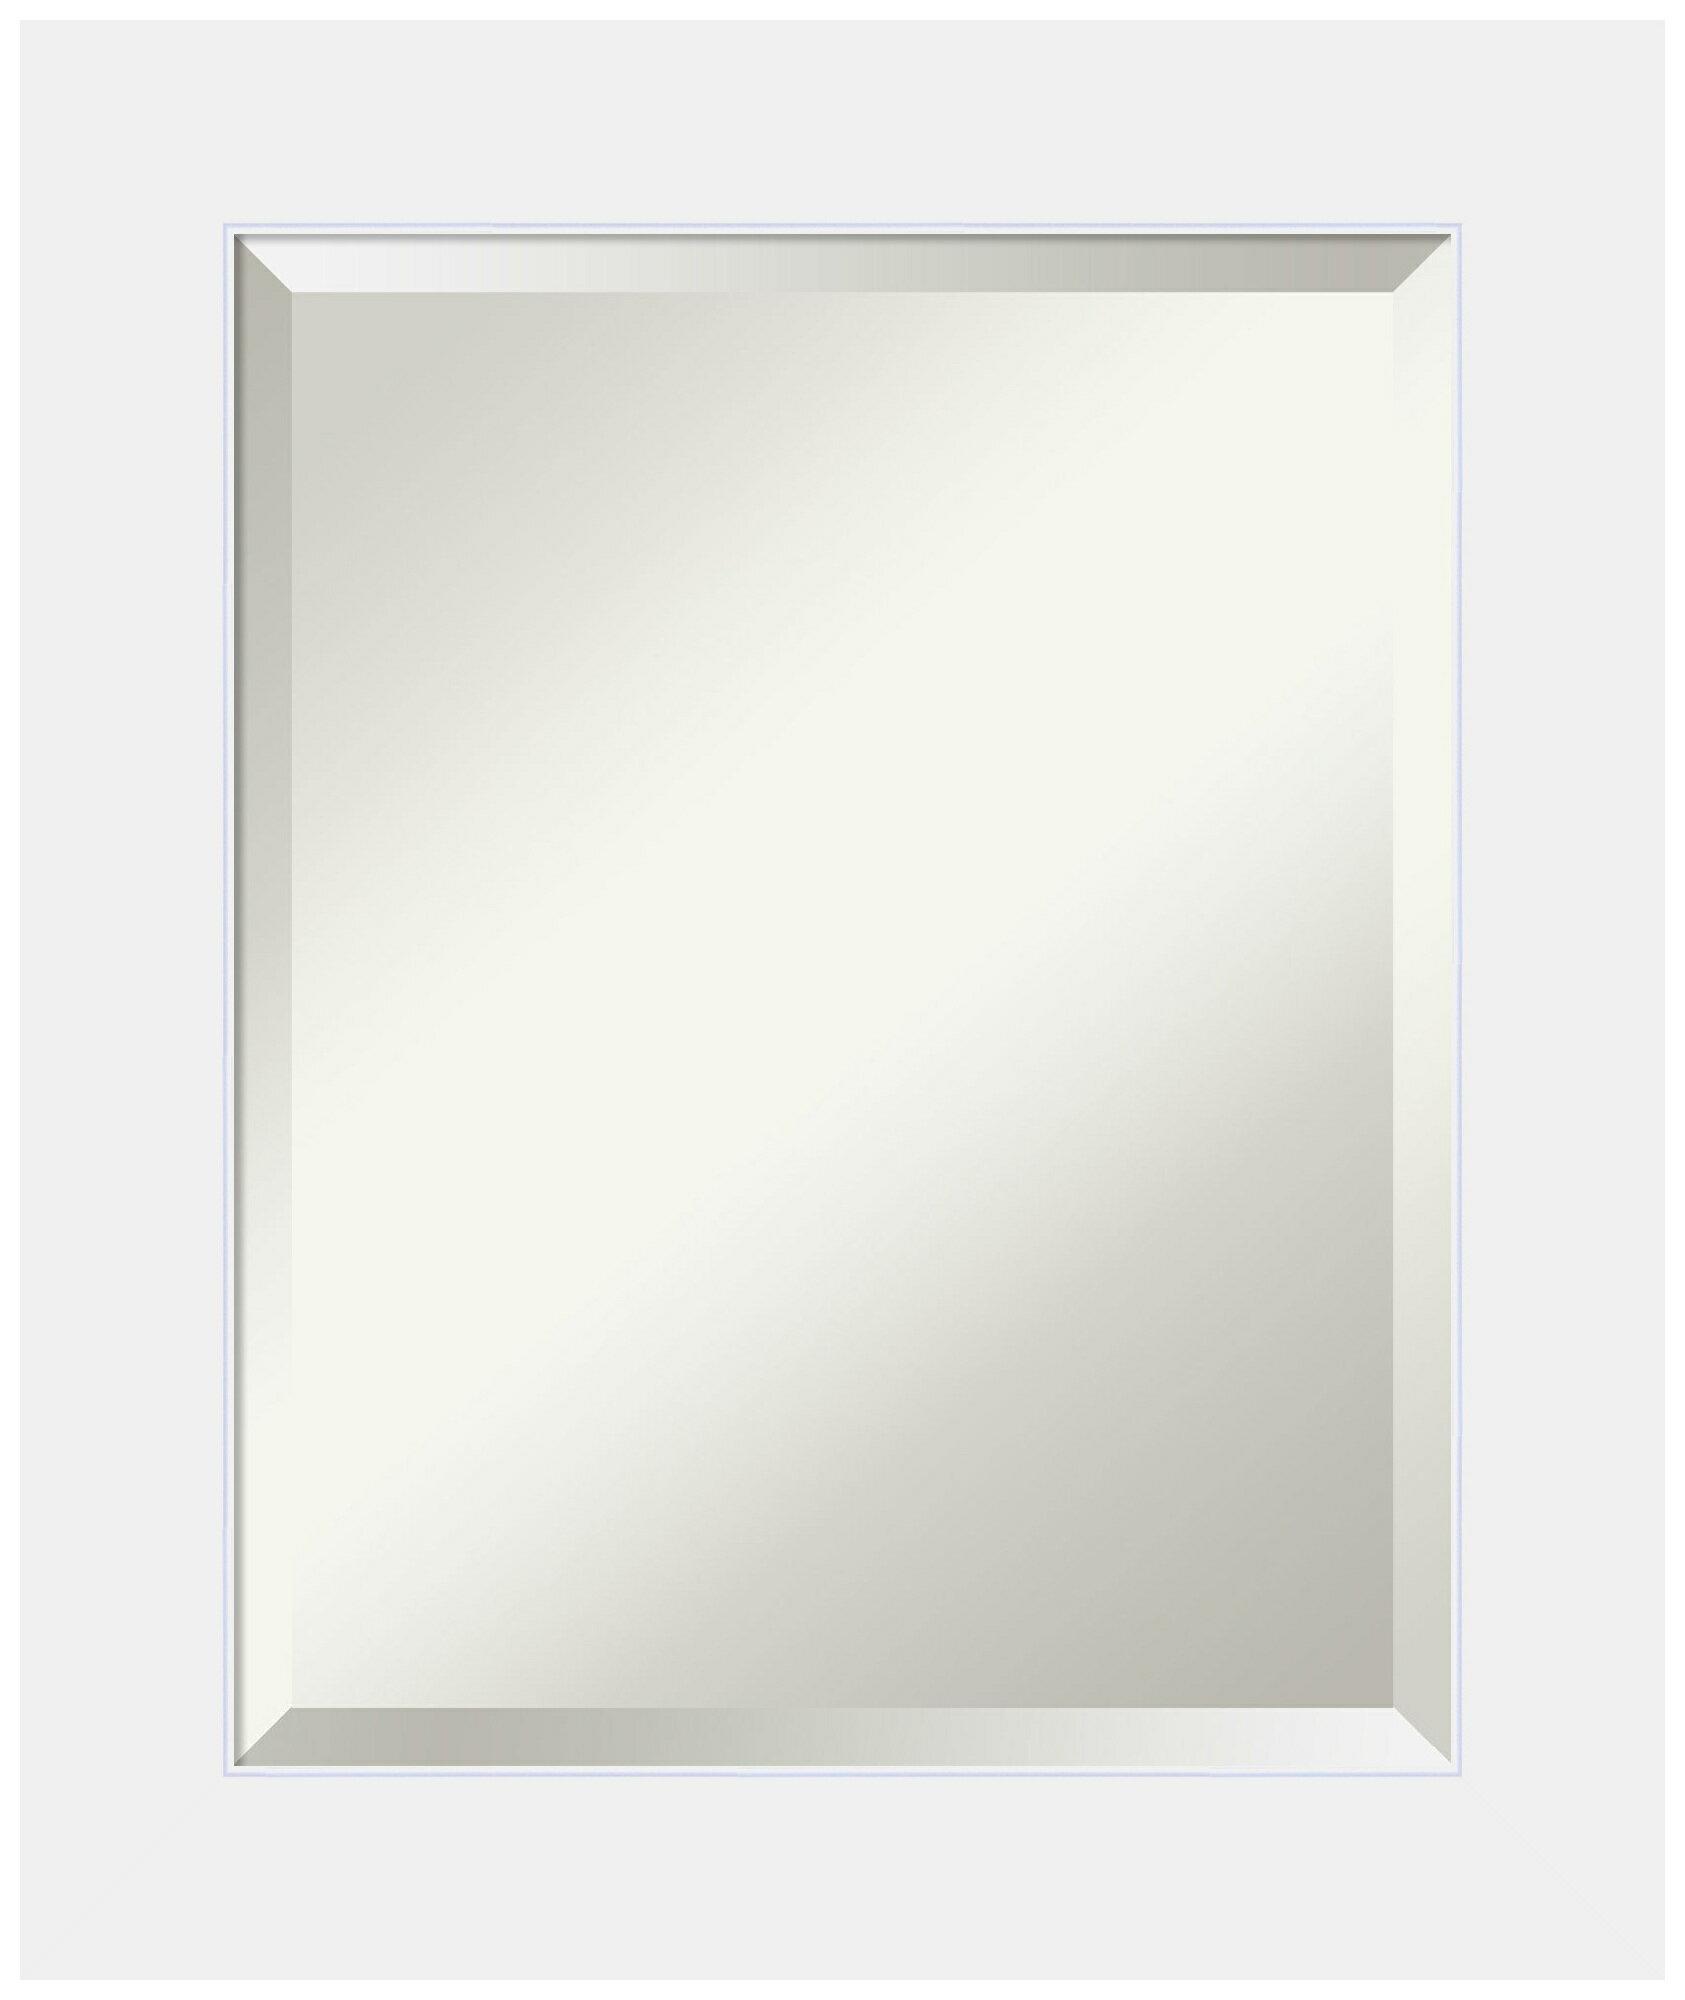 Vanity Mirror.Bathroom Vanity Mirror Corvino White Wood